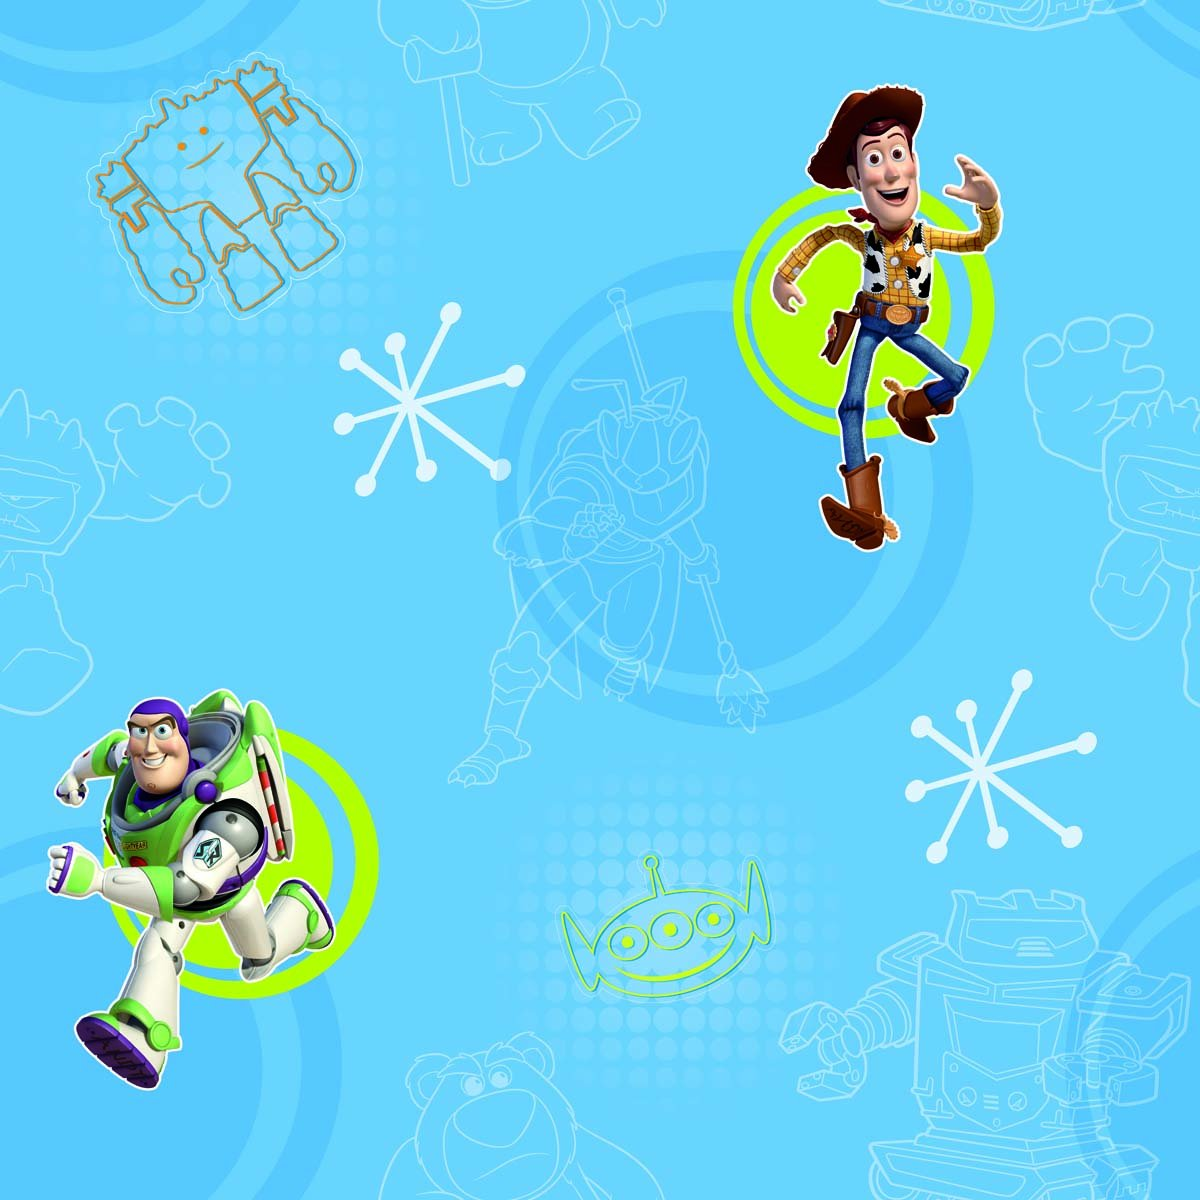 Disney Toy Story 3 Kids Wallpaper Playroom Bedroom Amazon Co Uk Diy Tools